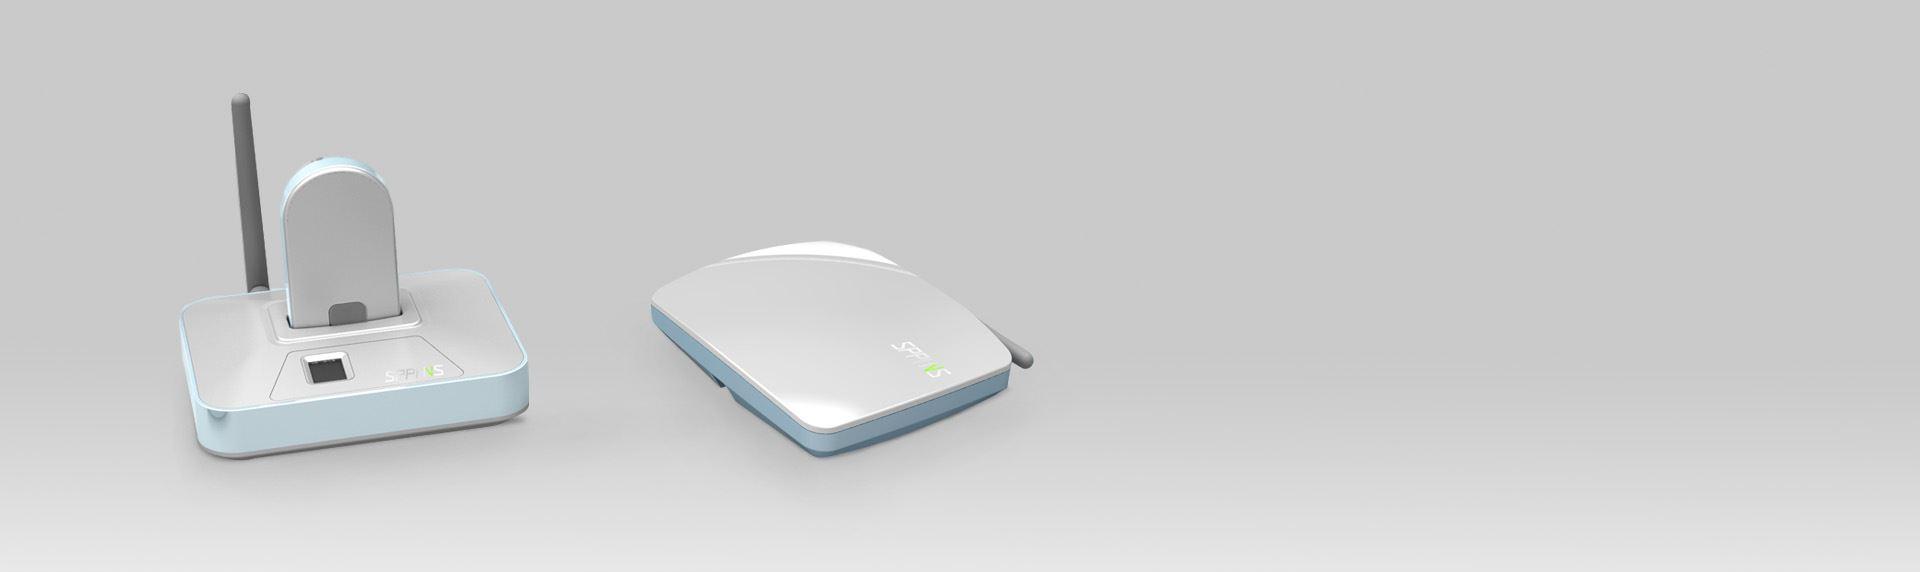 SSC设计-紫外消毒仪控制监测仪